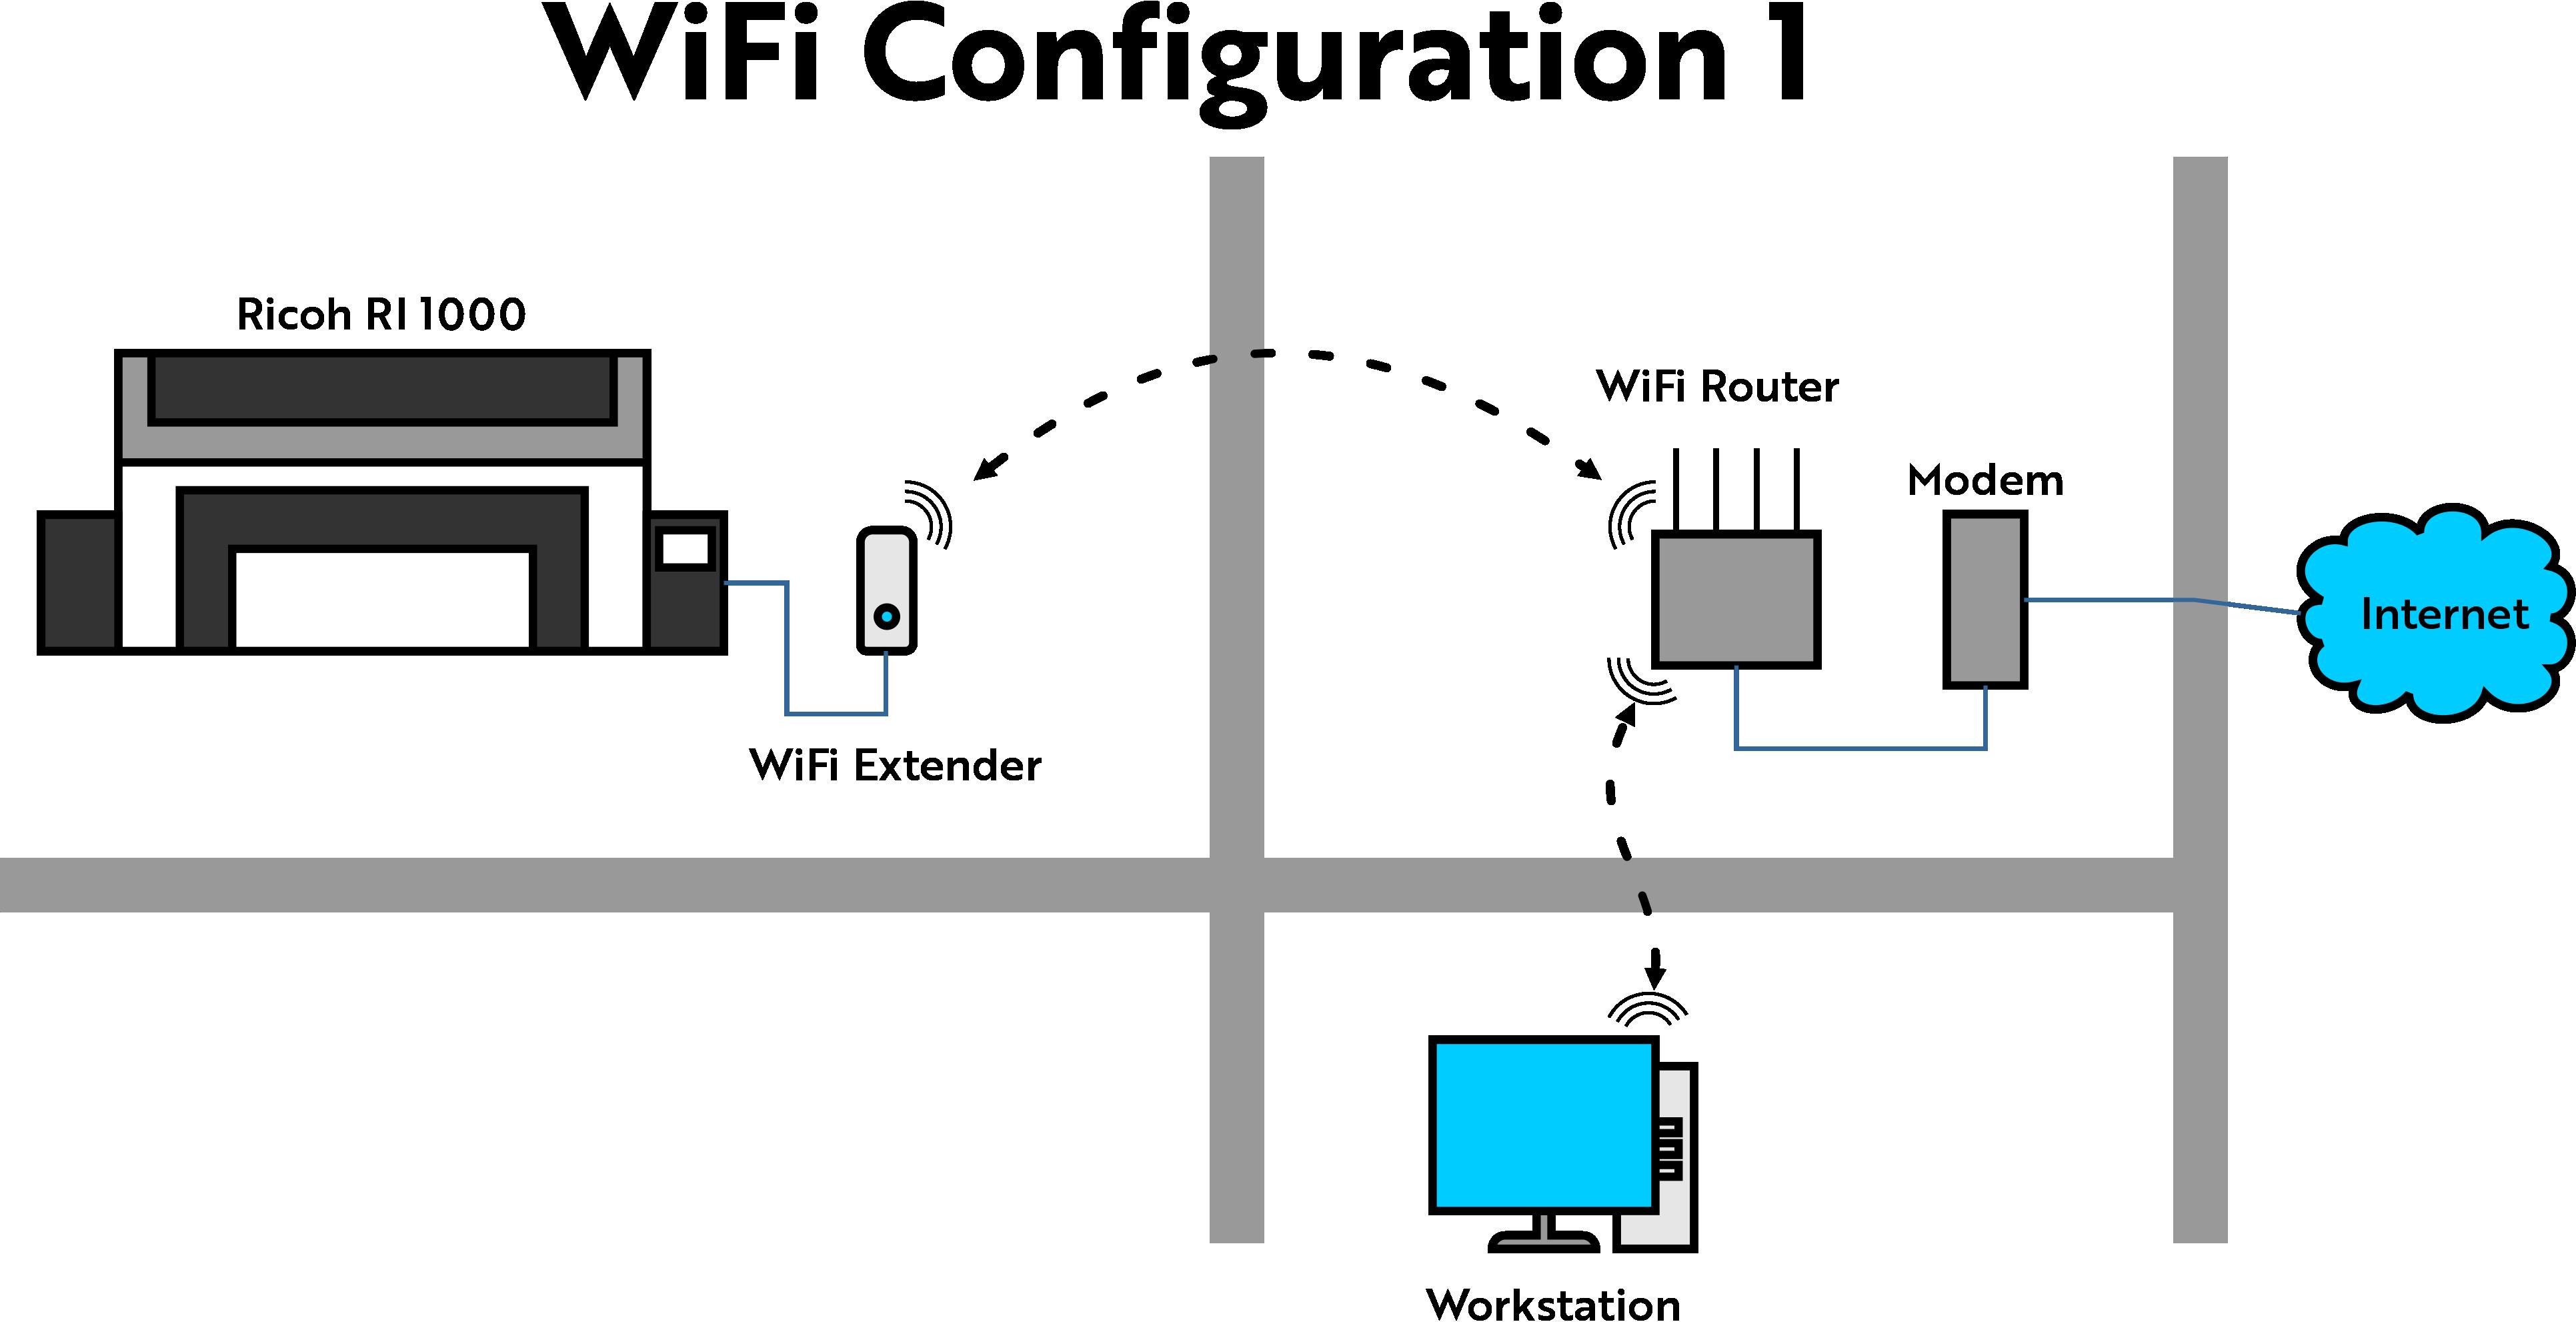 WiFi Network Configuration 1